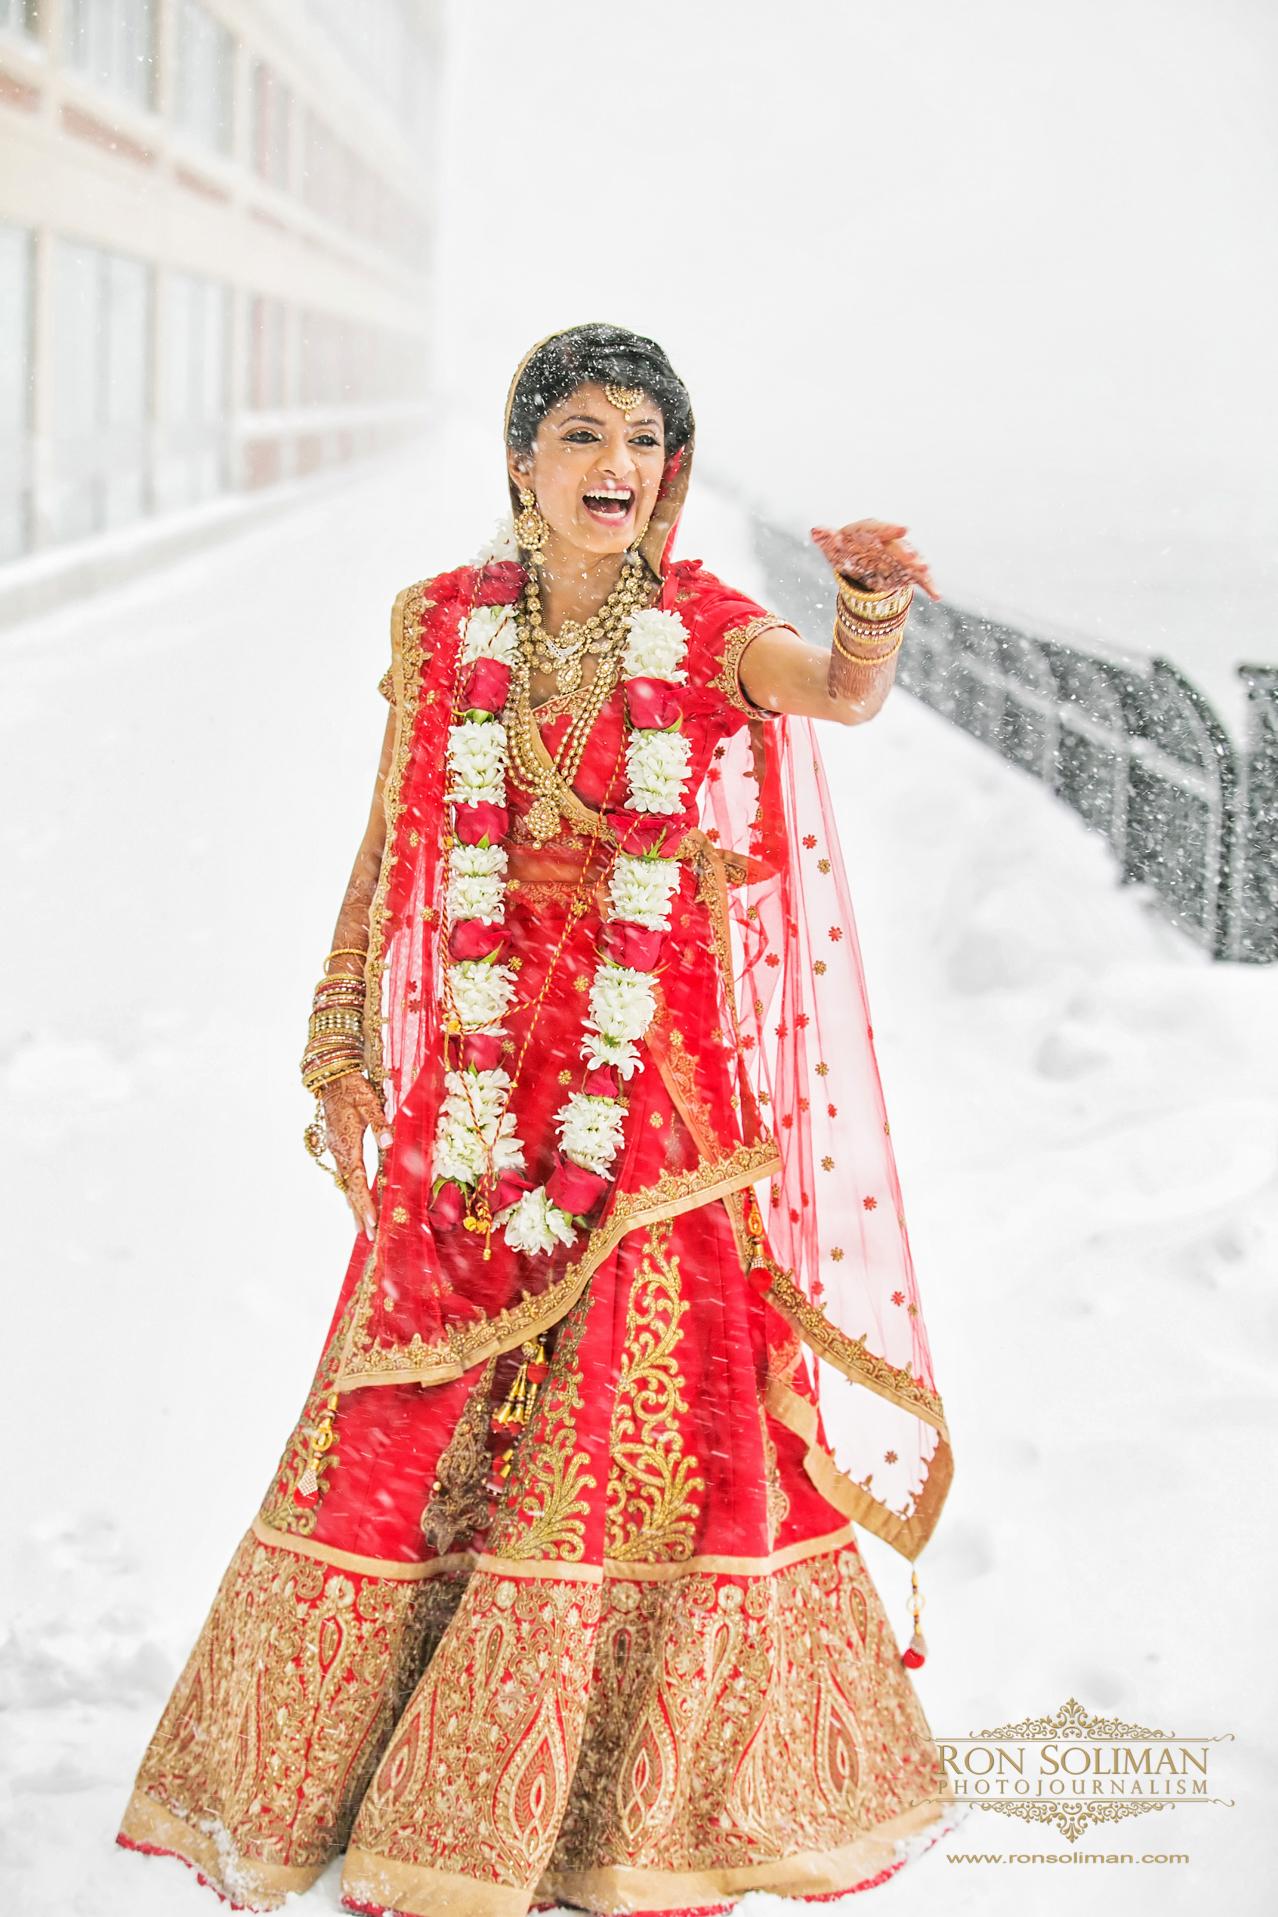 Best Snow wedding photos